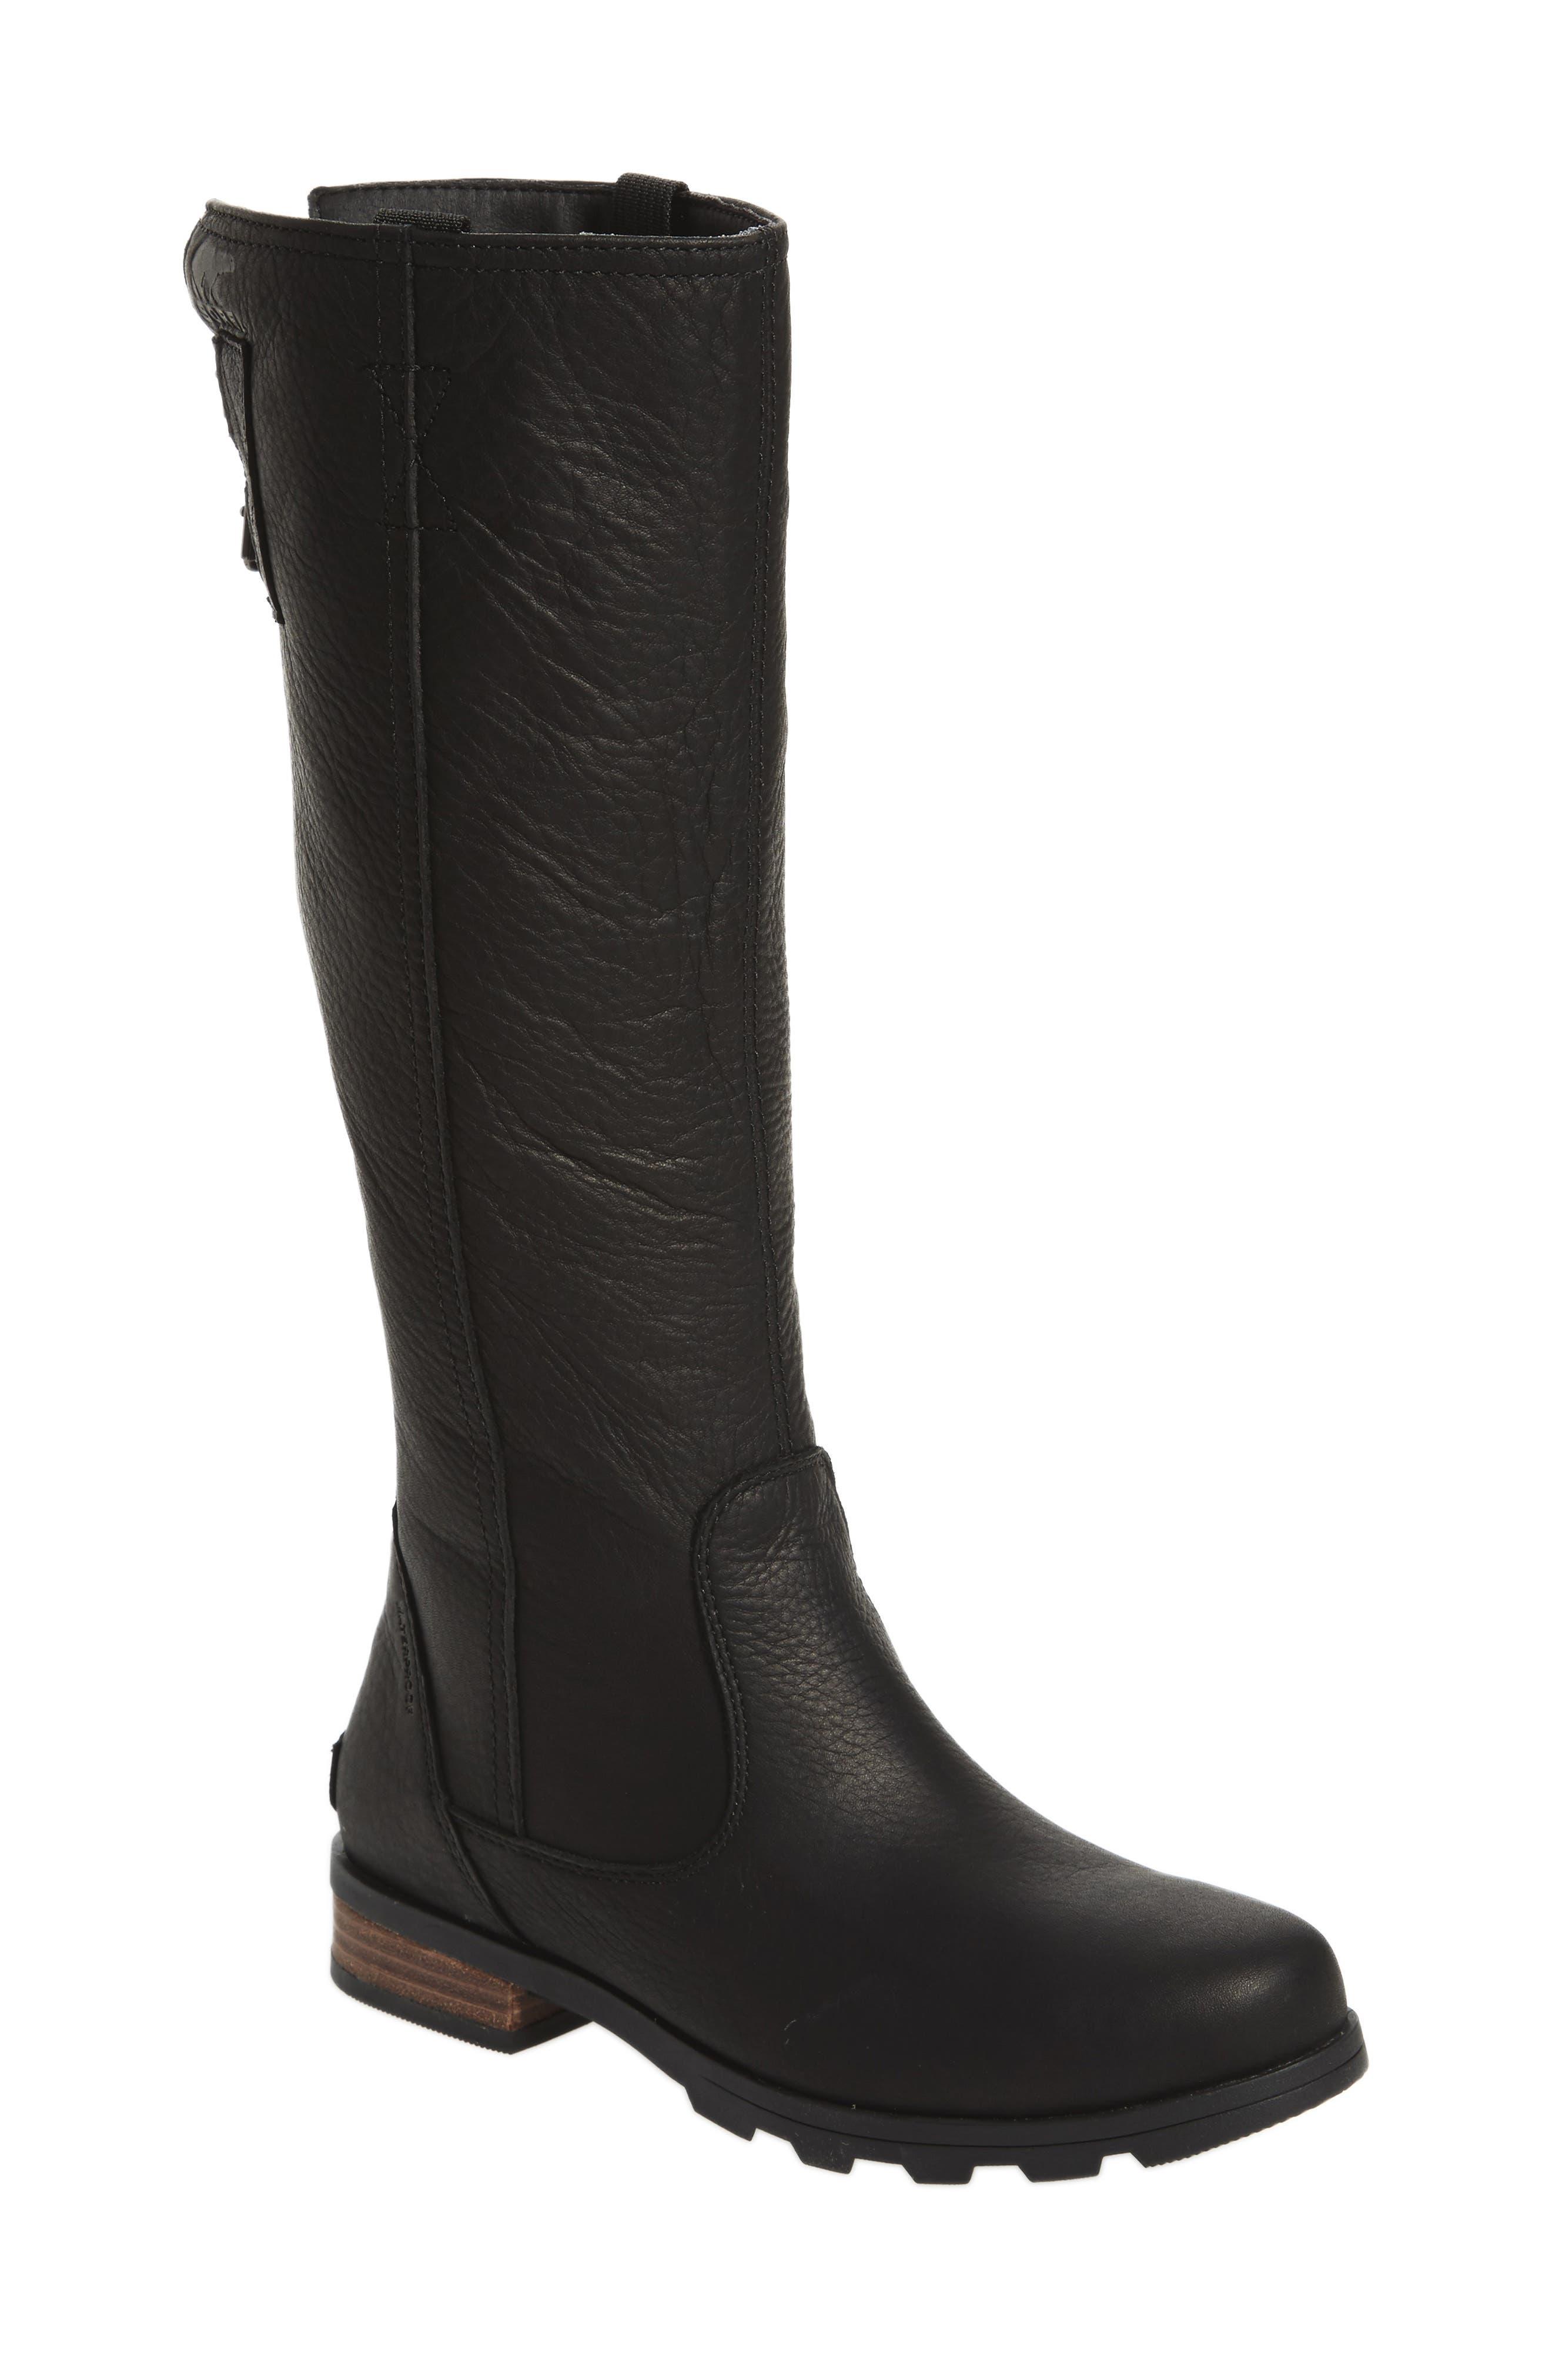 Alternate Image 1 Selected - SOREL Emelie Premium Knee High Boot (Women)